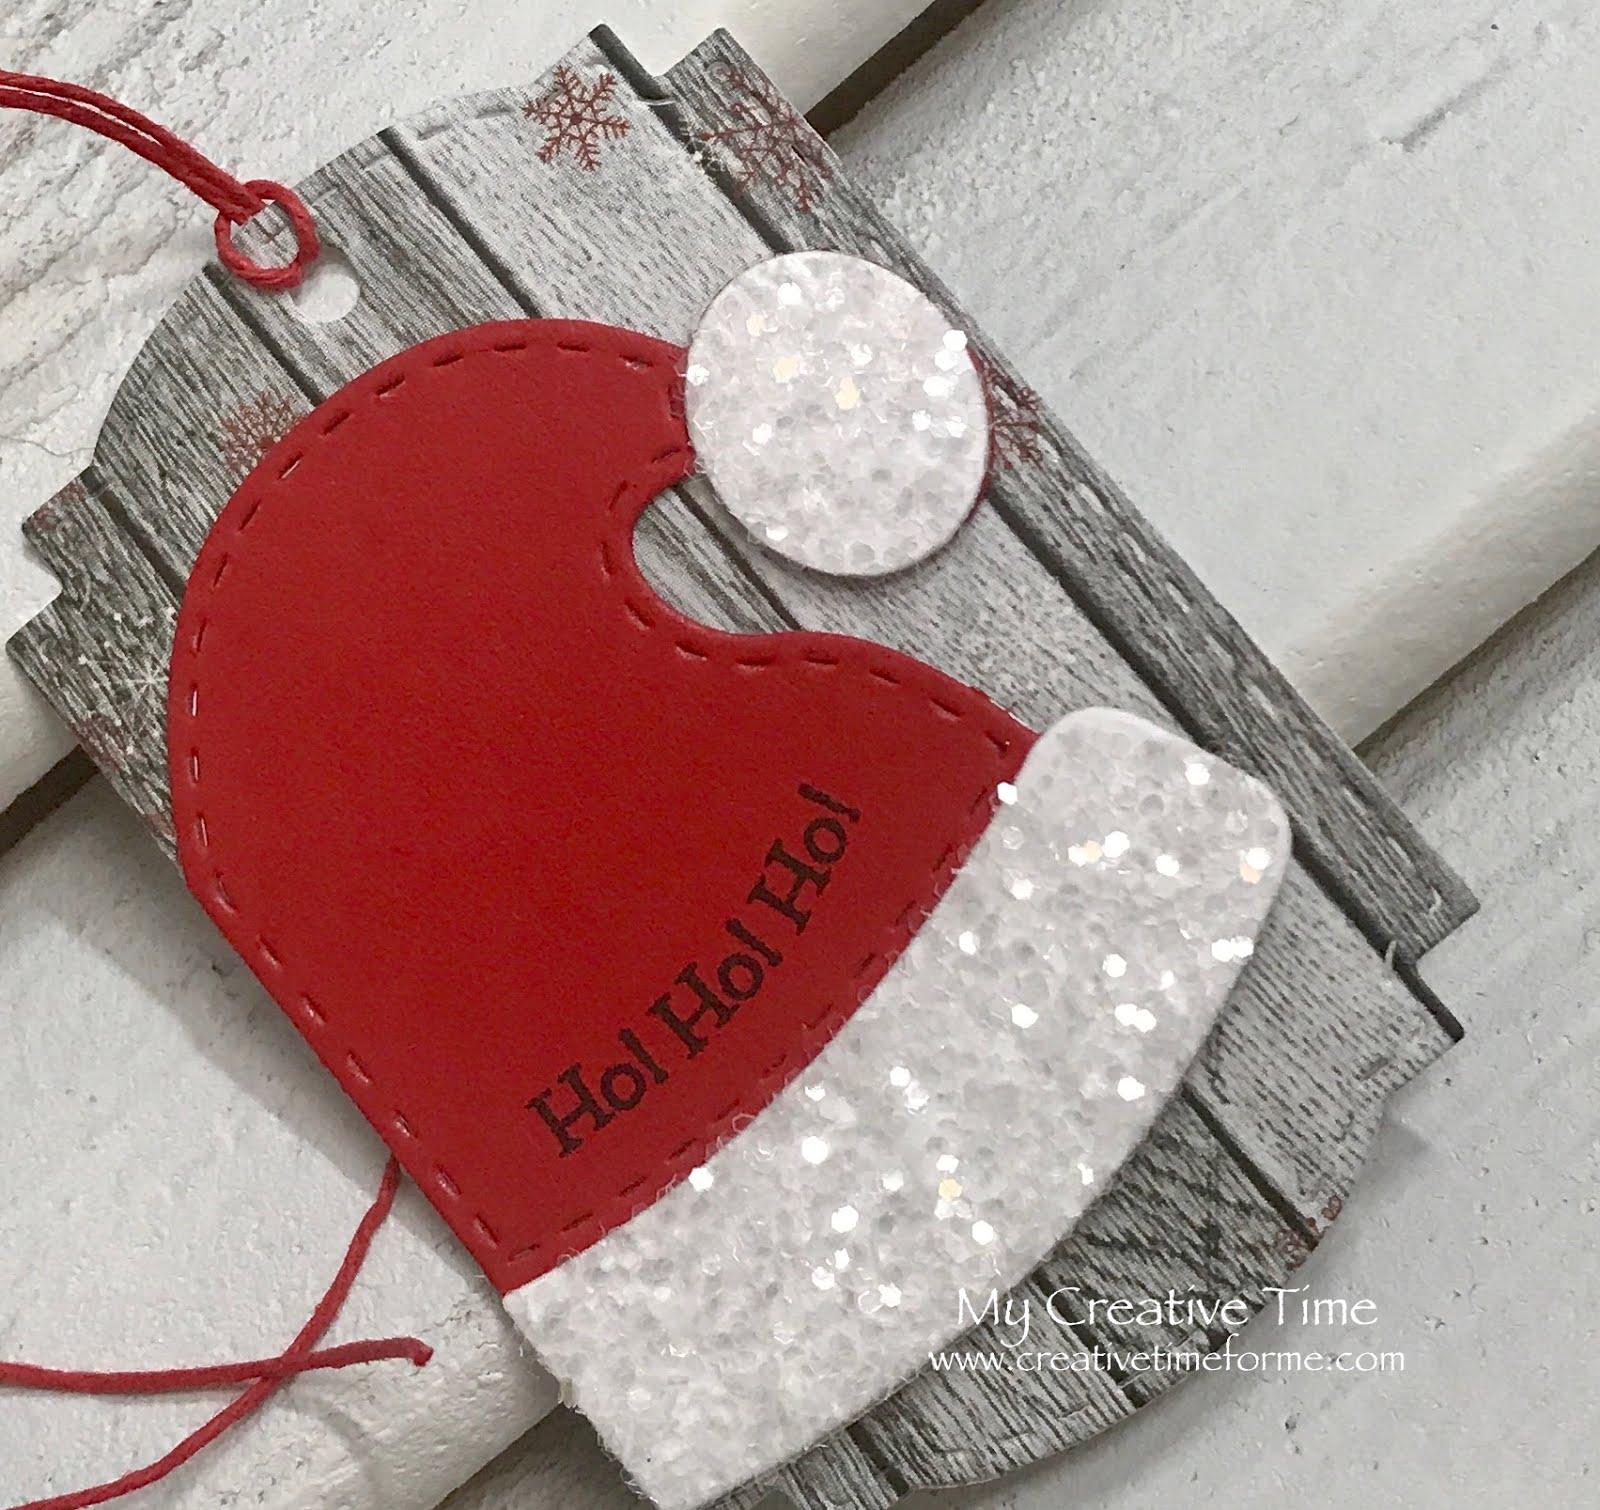 my creative time Cute Santa Hat Tag에 대한 이미지 검색결과